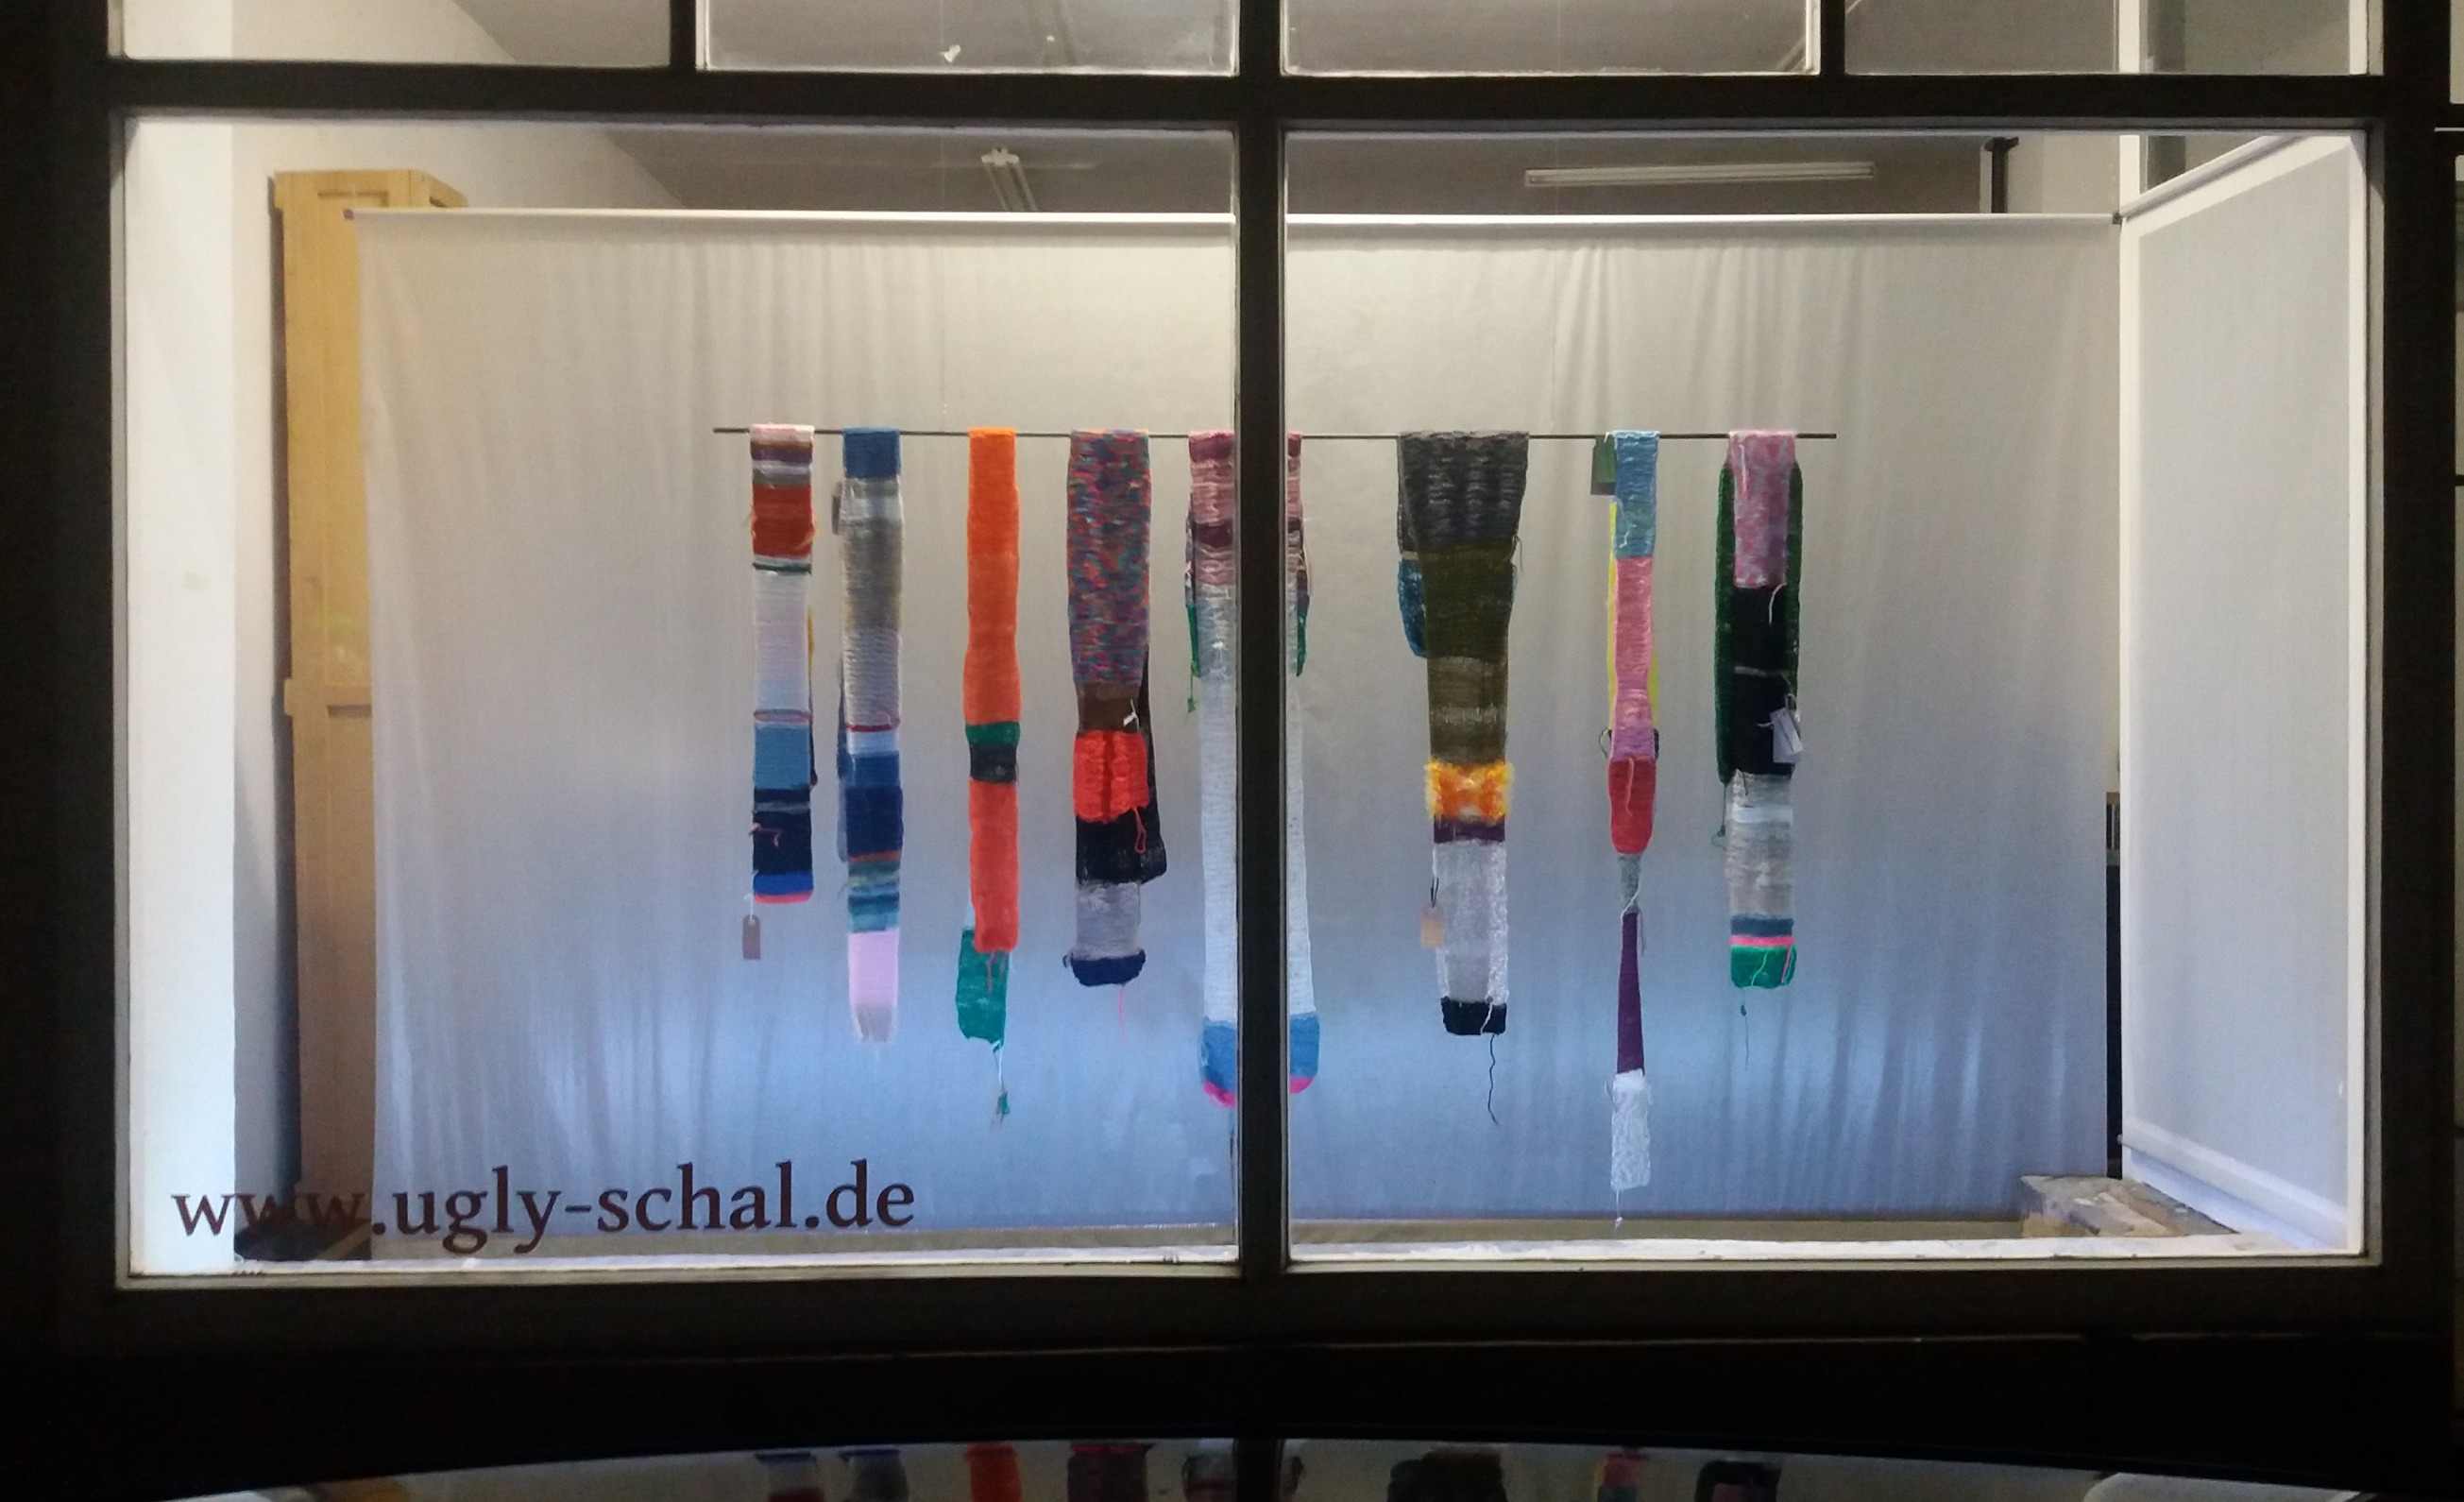 Hirschstr. Karlsruhe (12/18-12/19)